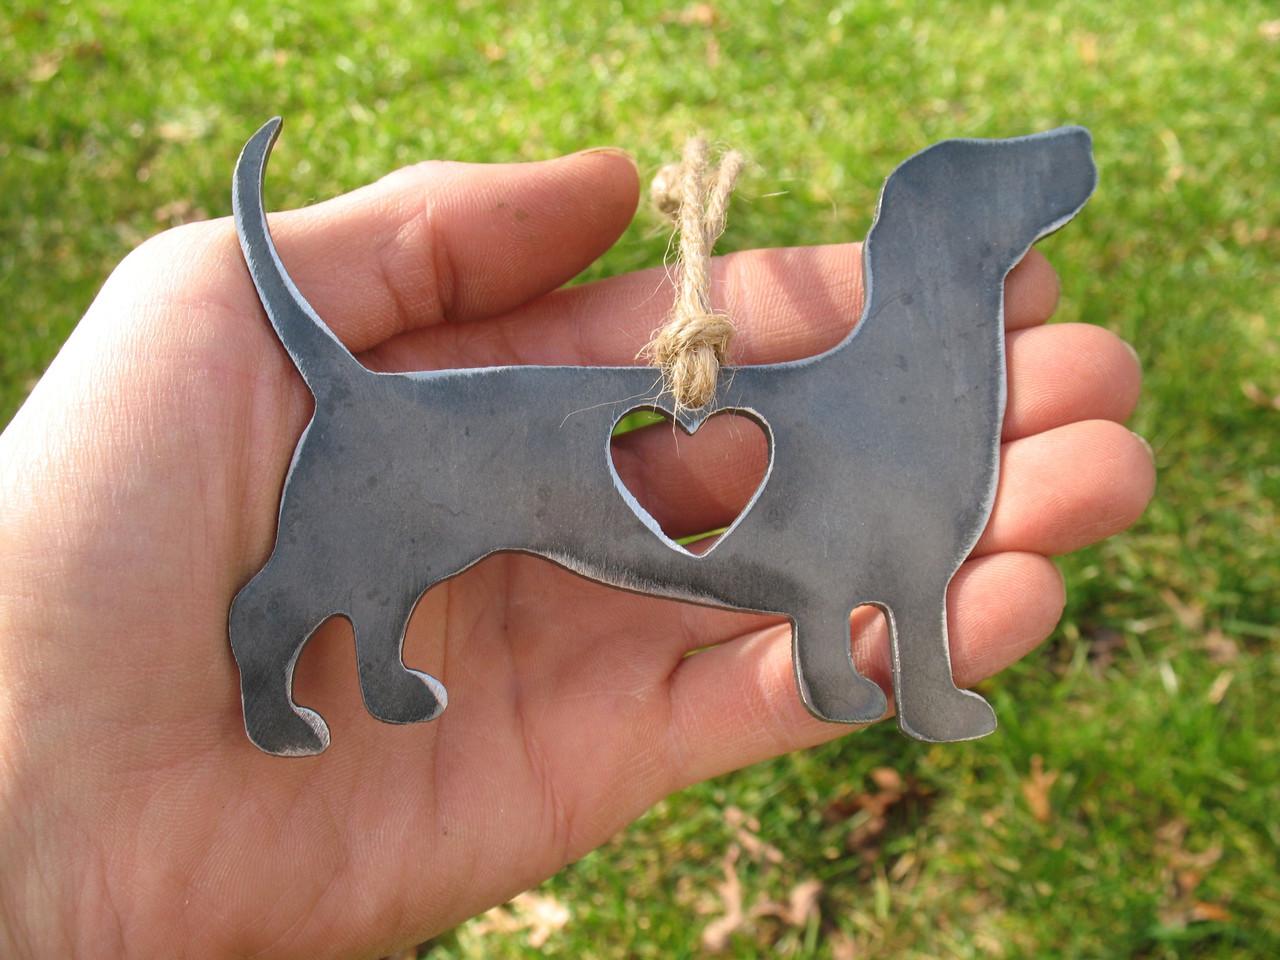 Dachshund Dog Ornament 1 - Metal Dog Easter Basket Gift for Her Him - Pet Lover Ornament - Pet Loss Dog Memorial Ornament Remembrance Gift